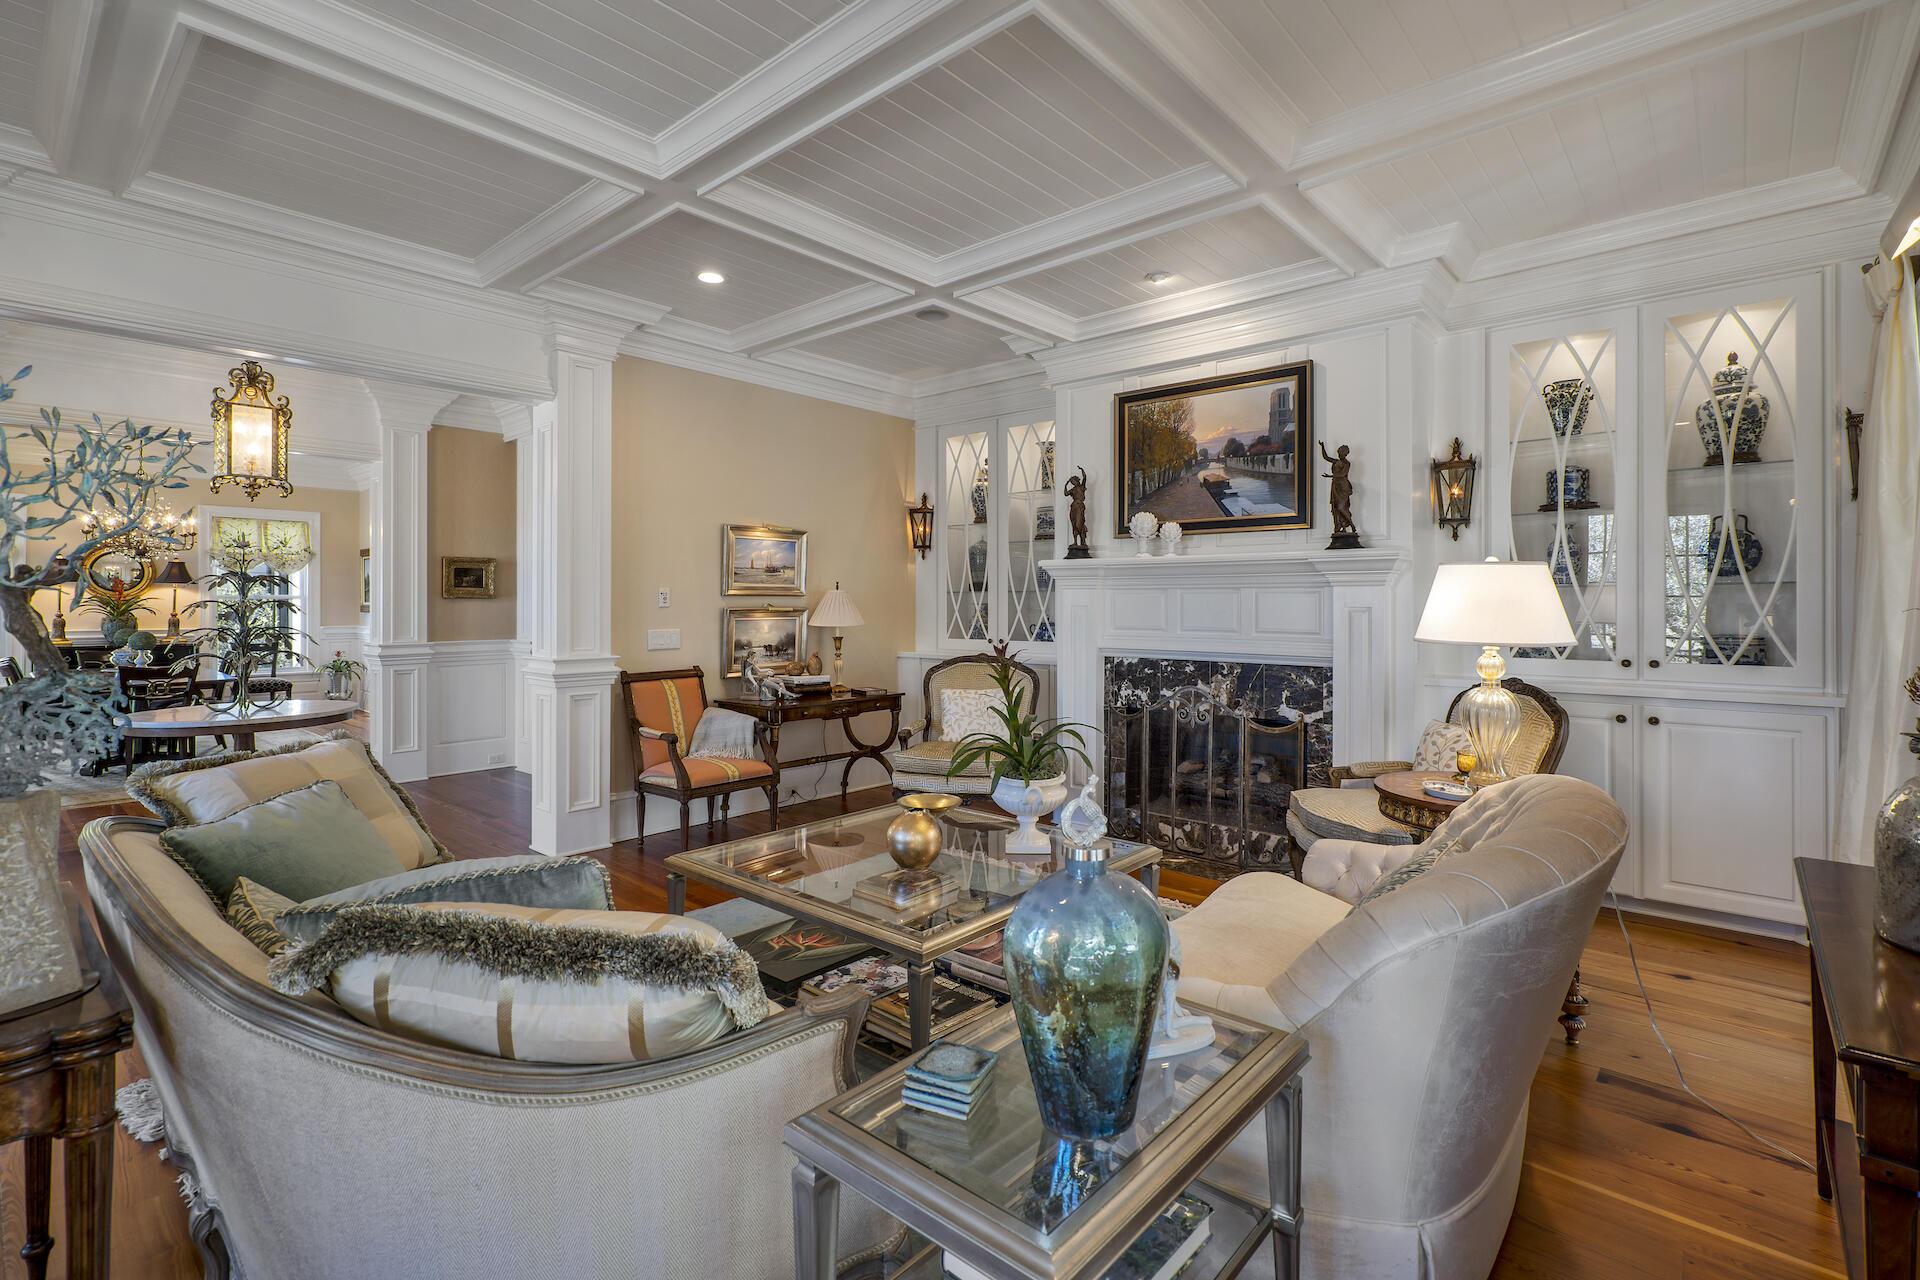 Daniel Island Homes For Sale - 623 Island Park, Charleston, SC - 32